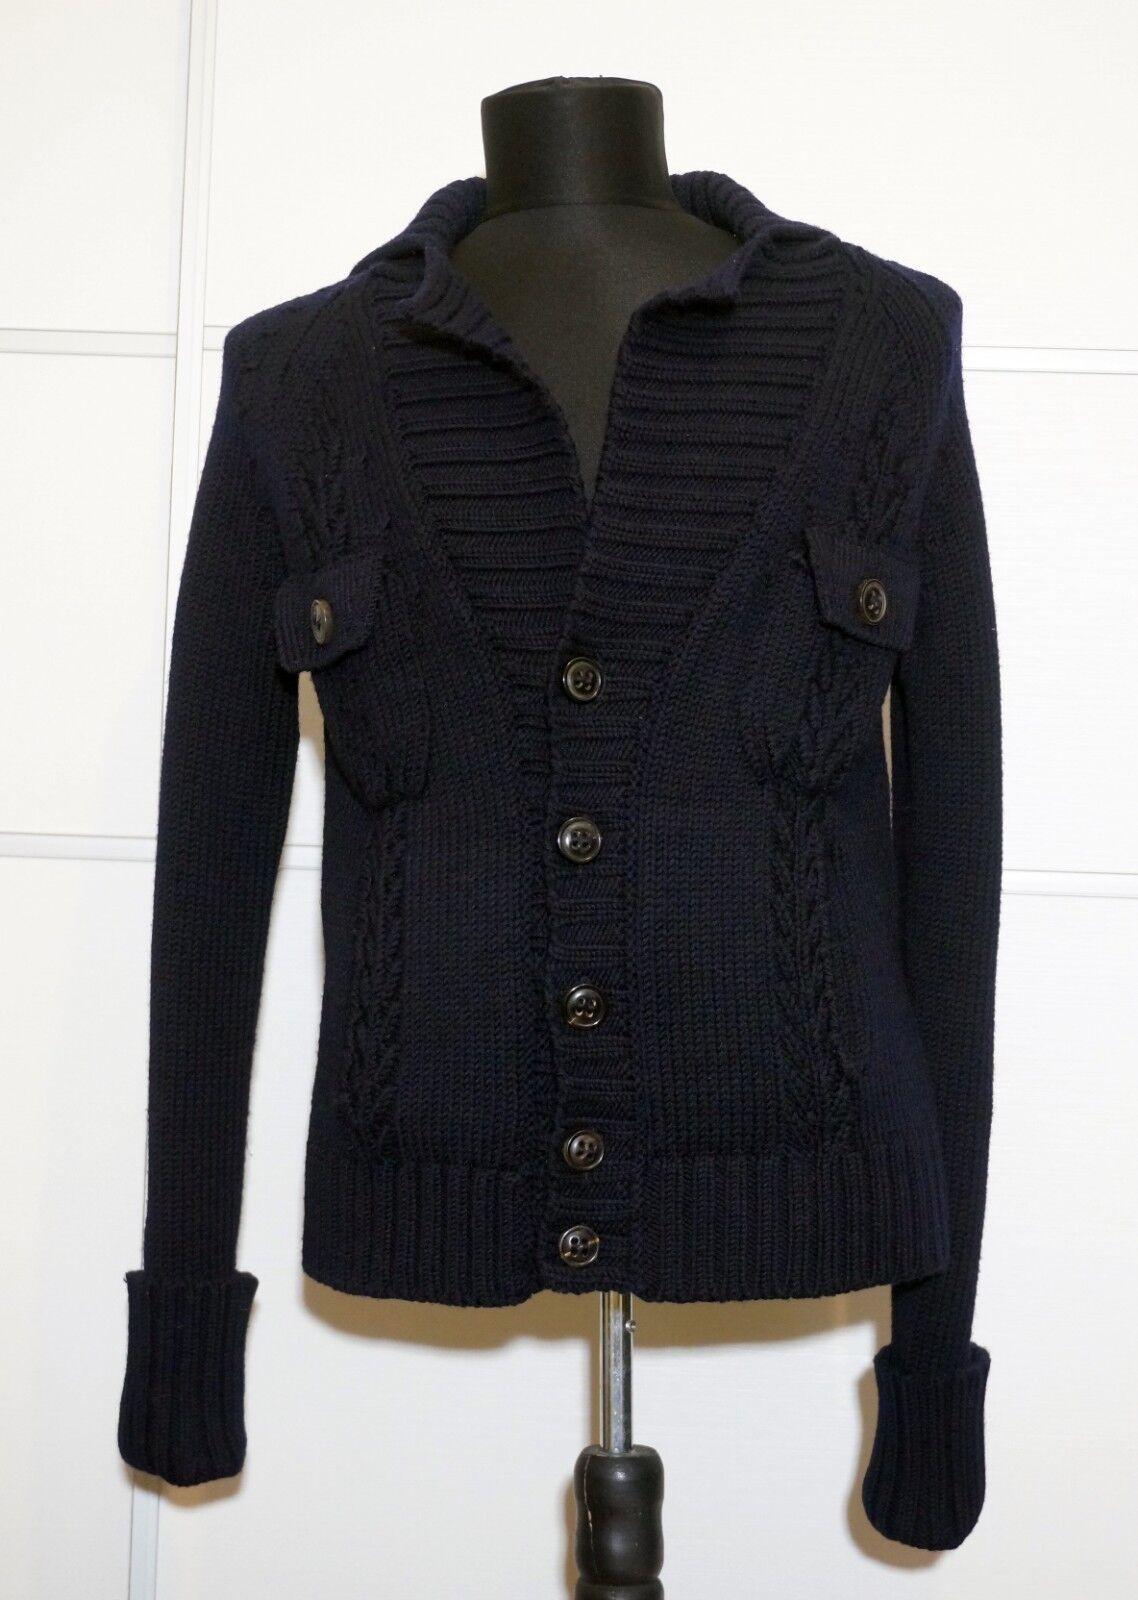 DsquaROT2 100% Wool Dark Blau Knitted Cardigan , Größe:S